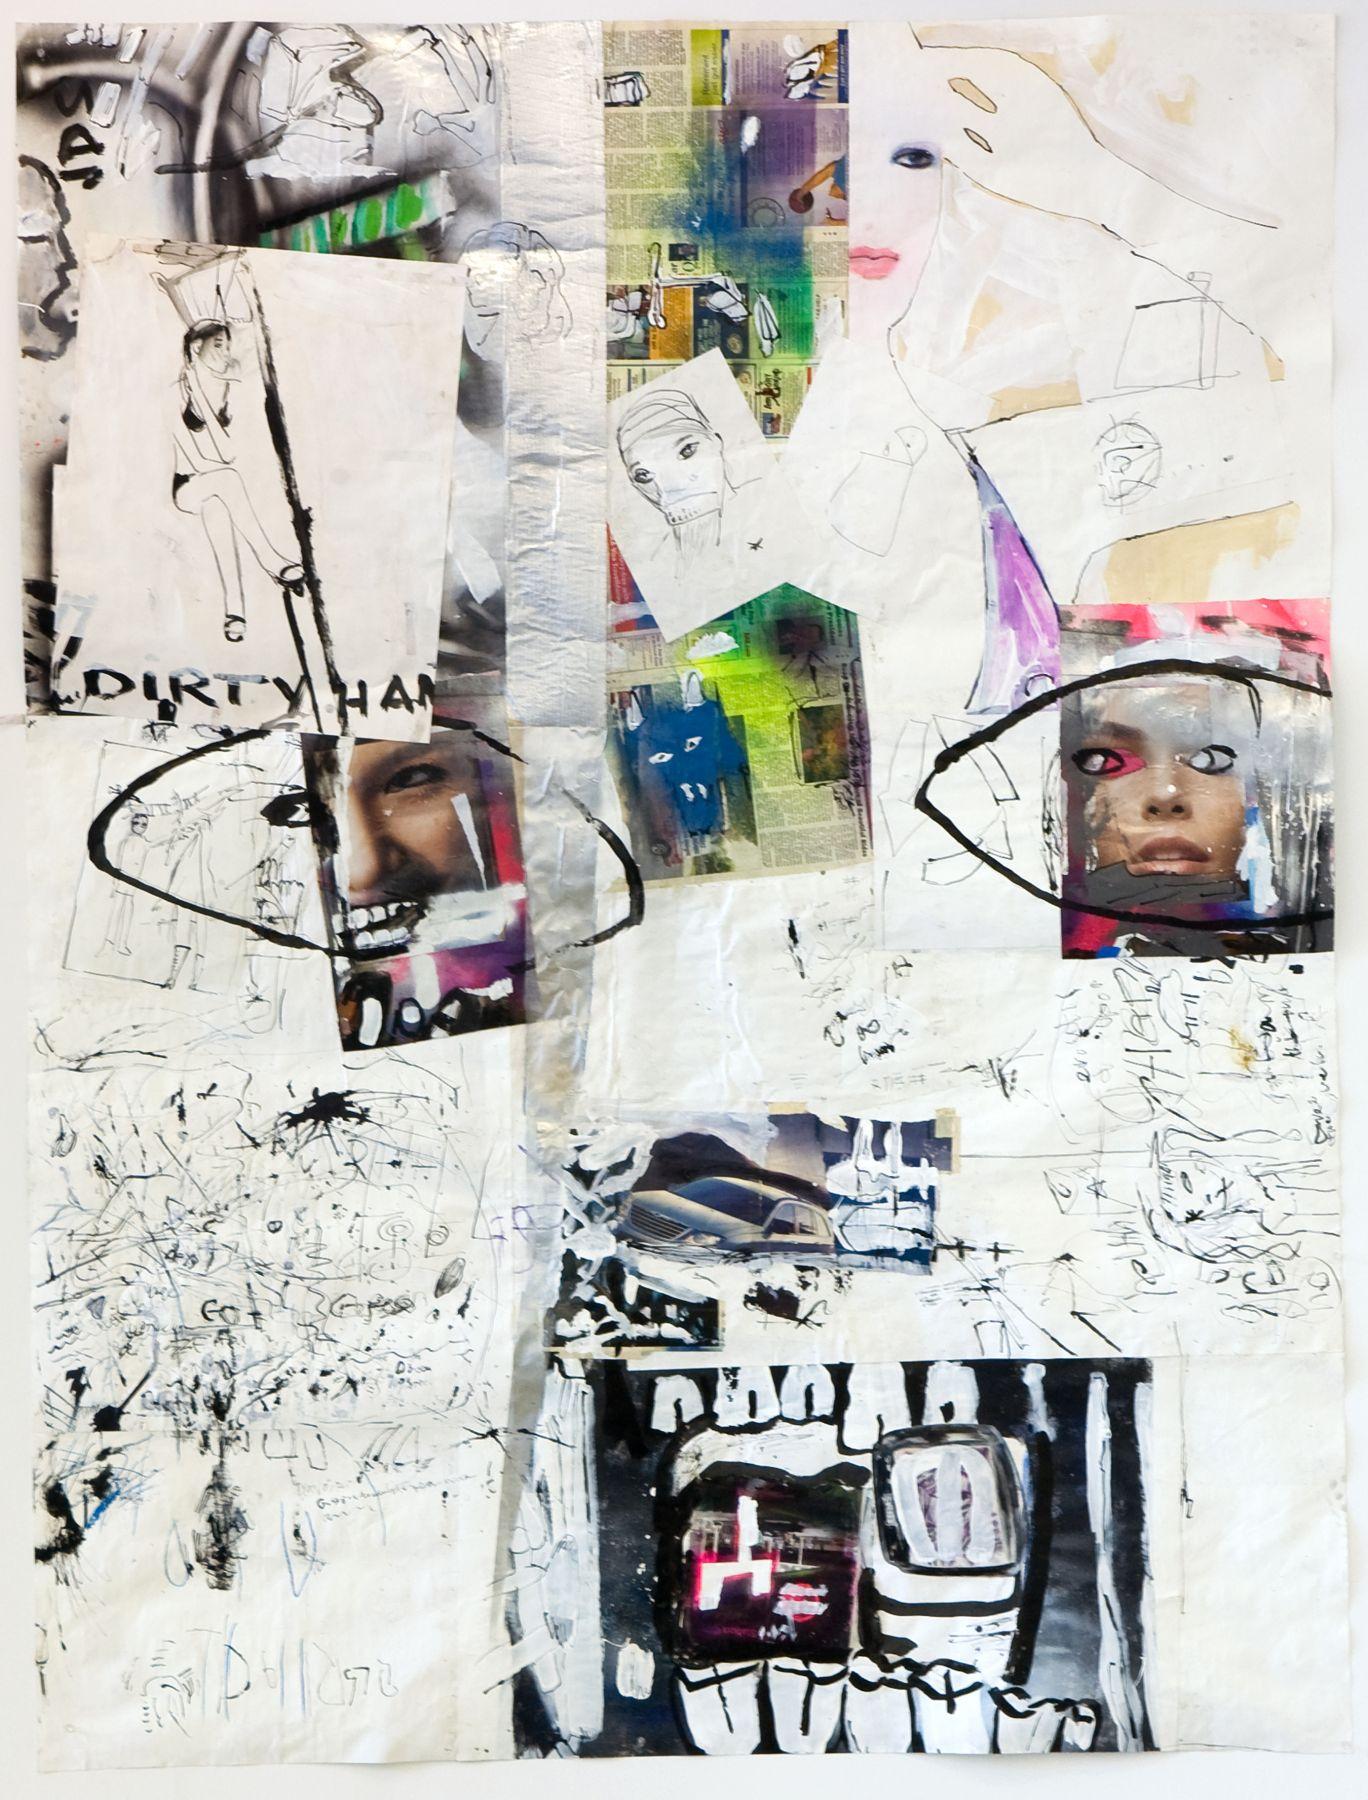 DOUGLAS KOLK, Dirty Hands,2009